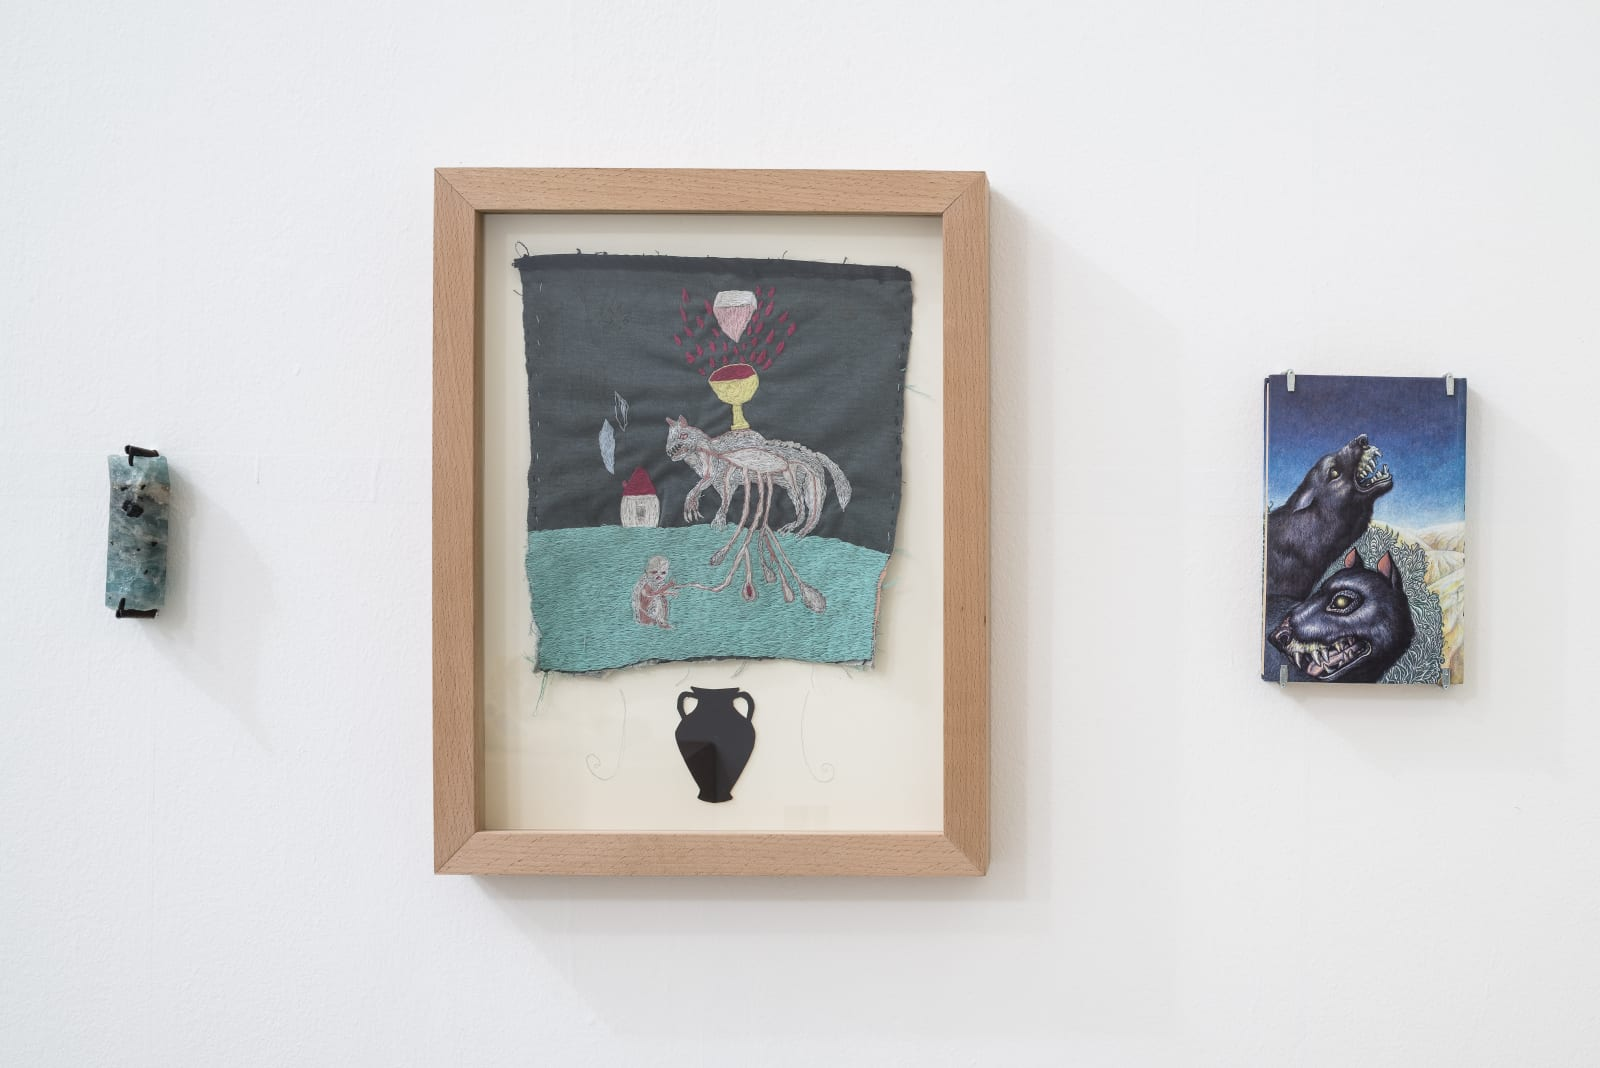 Evgeny Antufiev, Untitled, 2015, aquamarine cm 11.5 x 4 x 2, embroidery cm 64.5 x 36.5 x 5, book cm 20.5 x 13 x 2.5